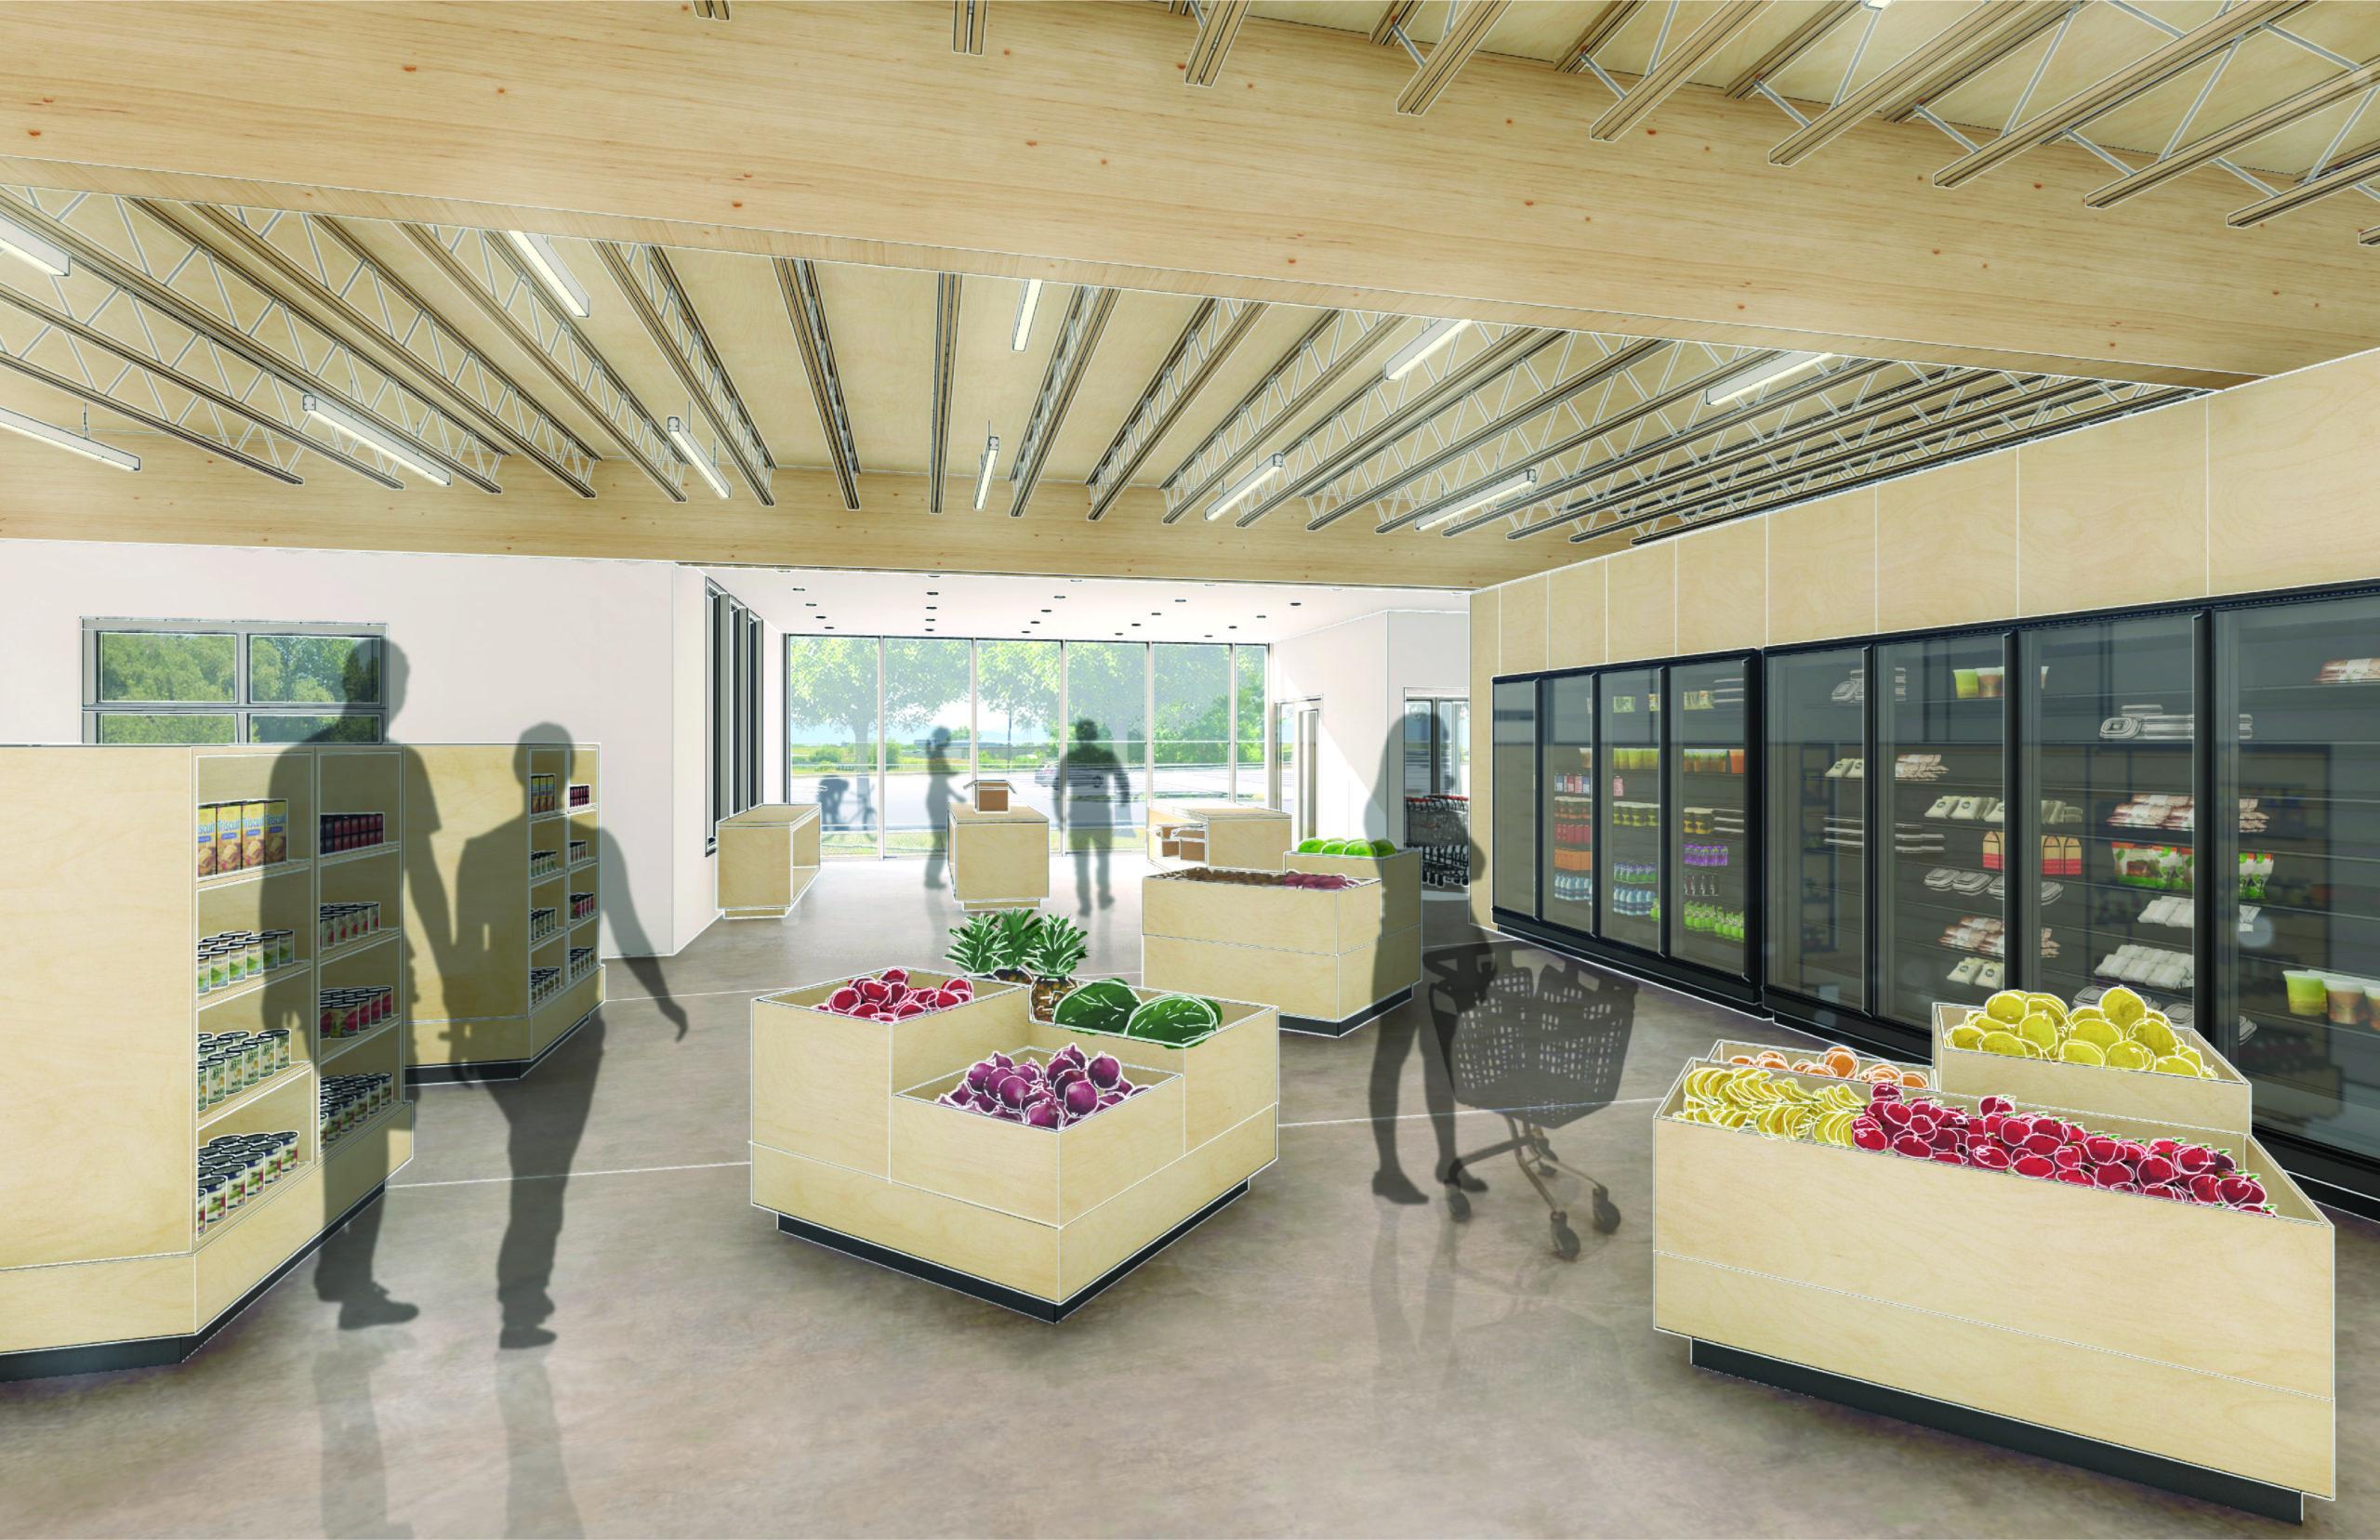 HRDC food resource center store